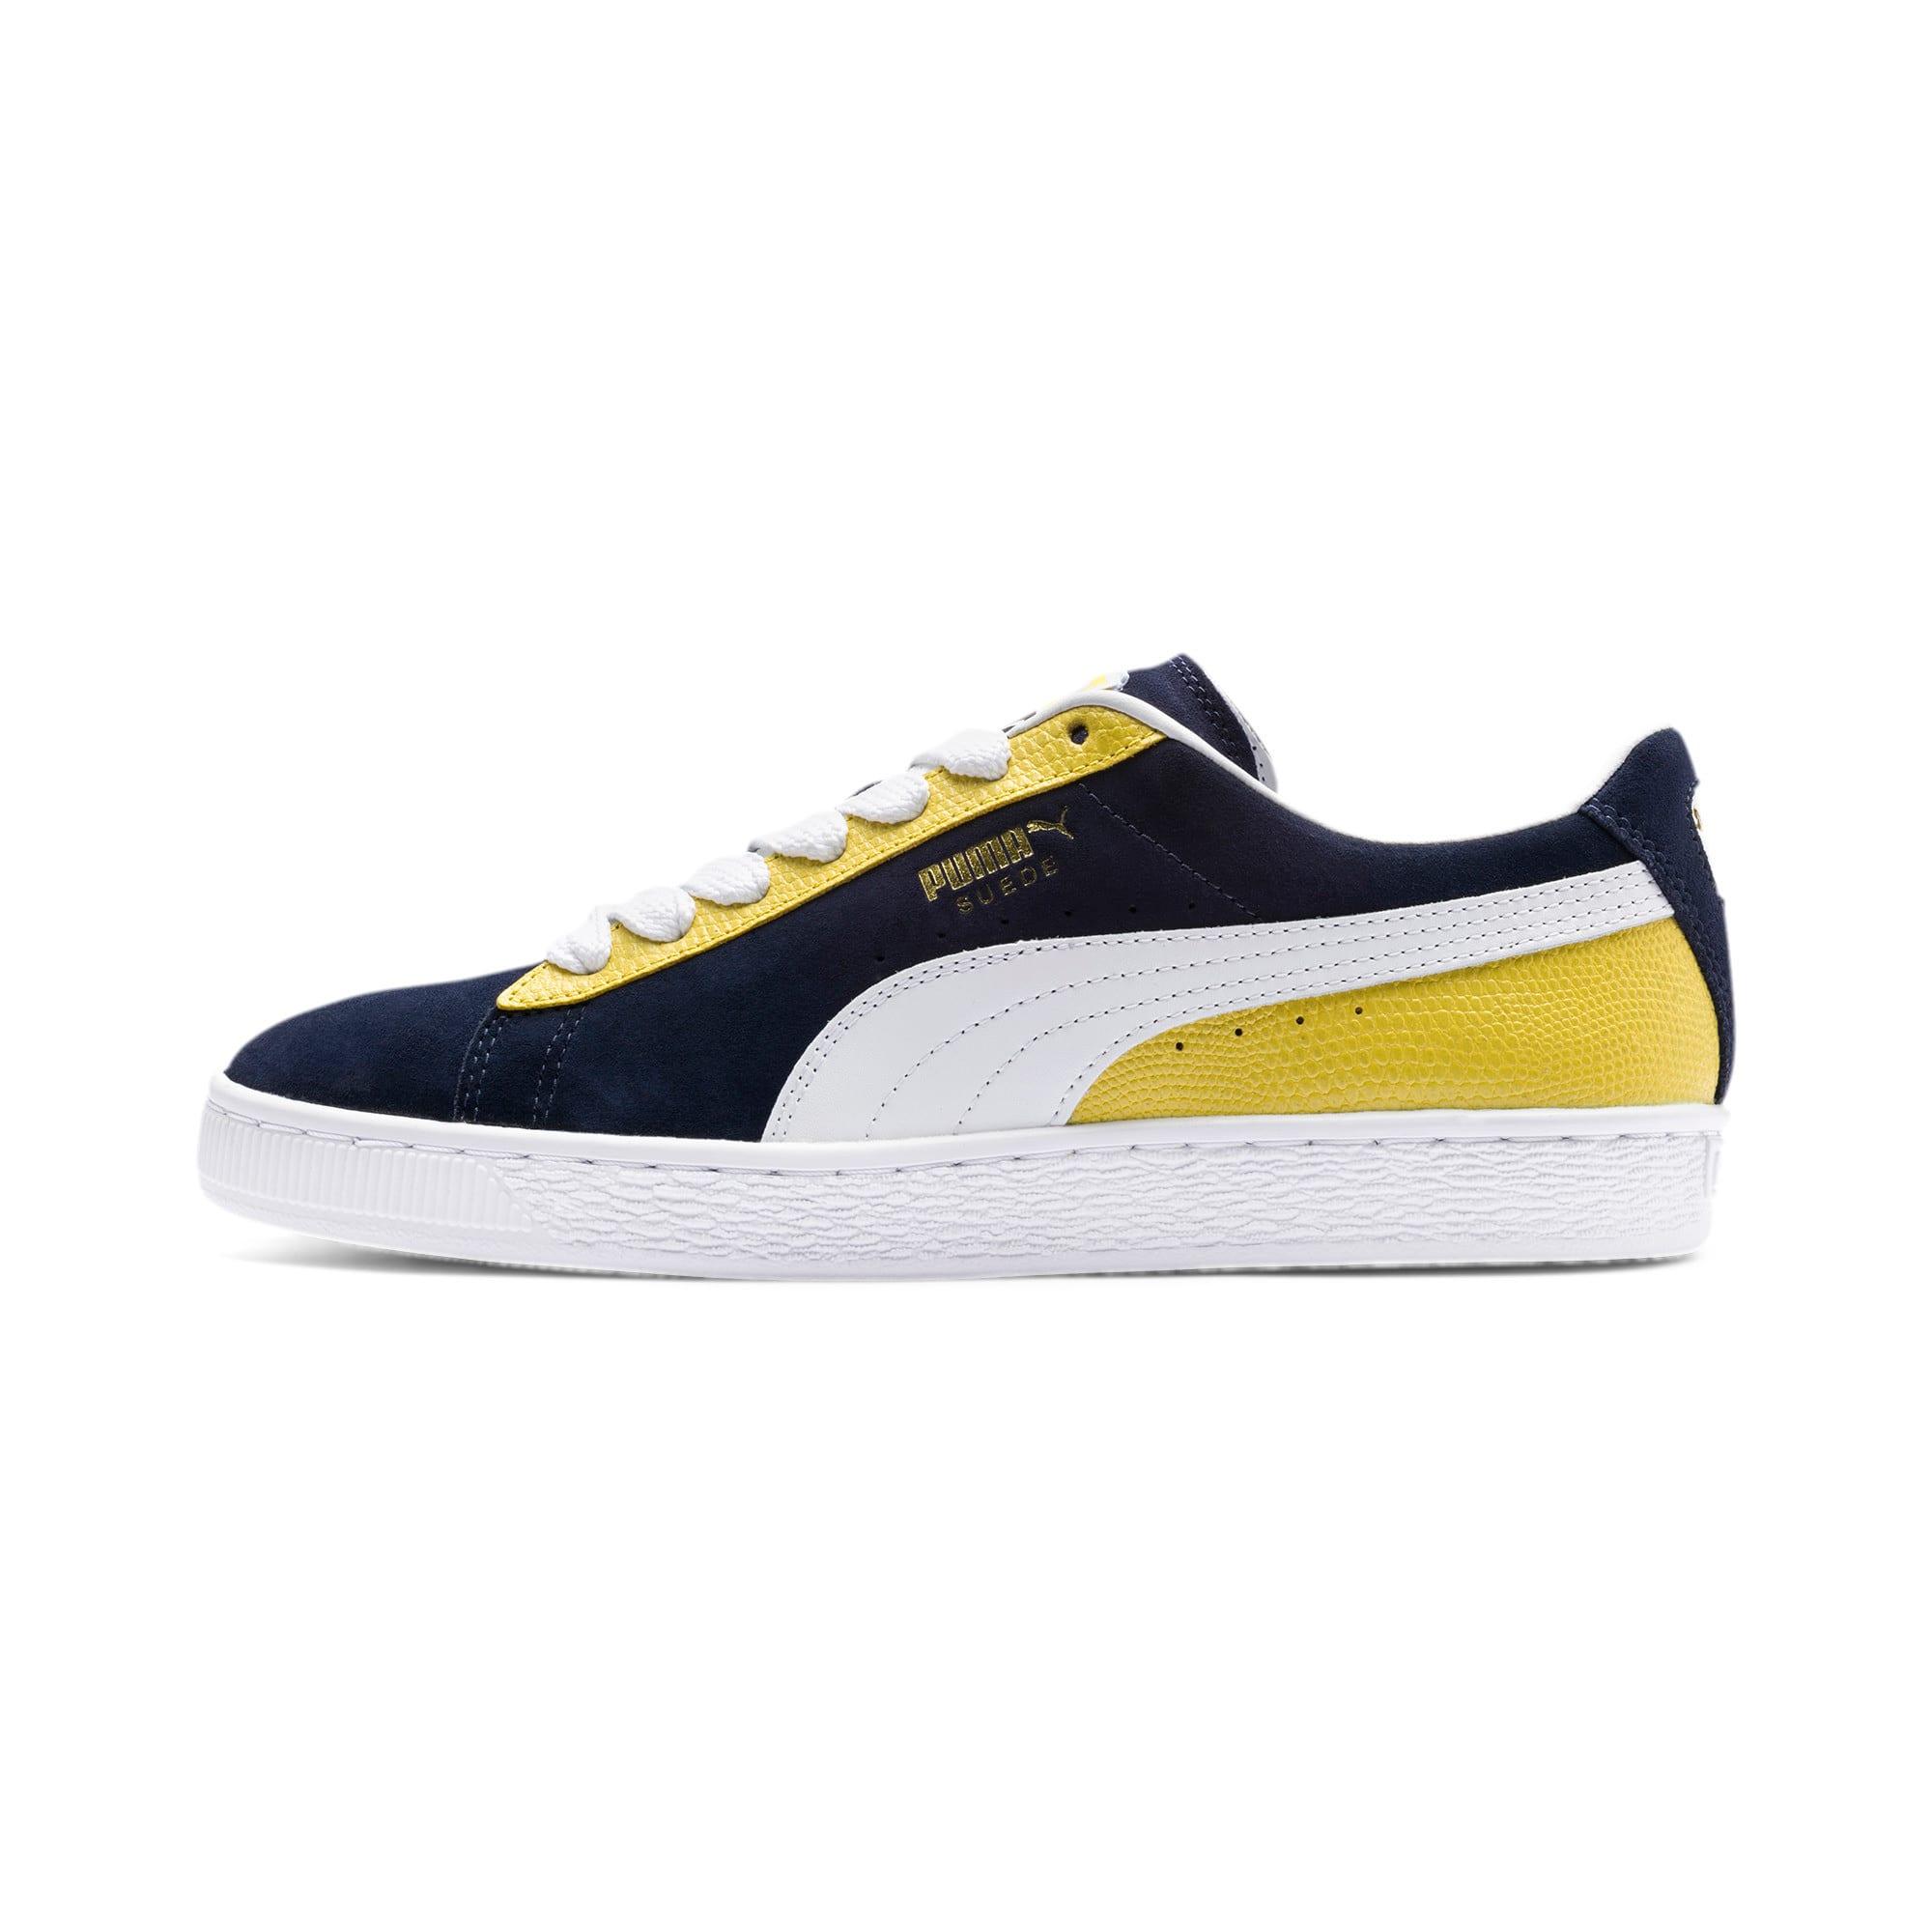 Miniatura 1 de Zapatos deportivos Suede Classic Block, Peacoat-Sulphur-Puma White, mediano